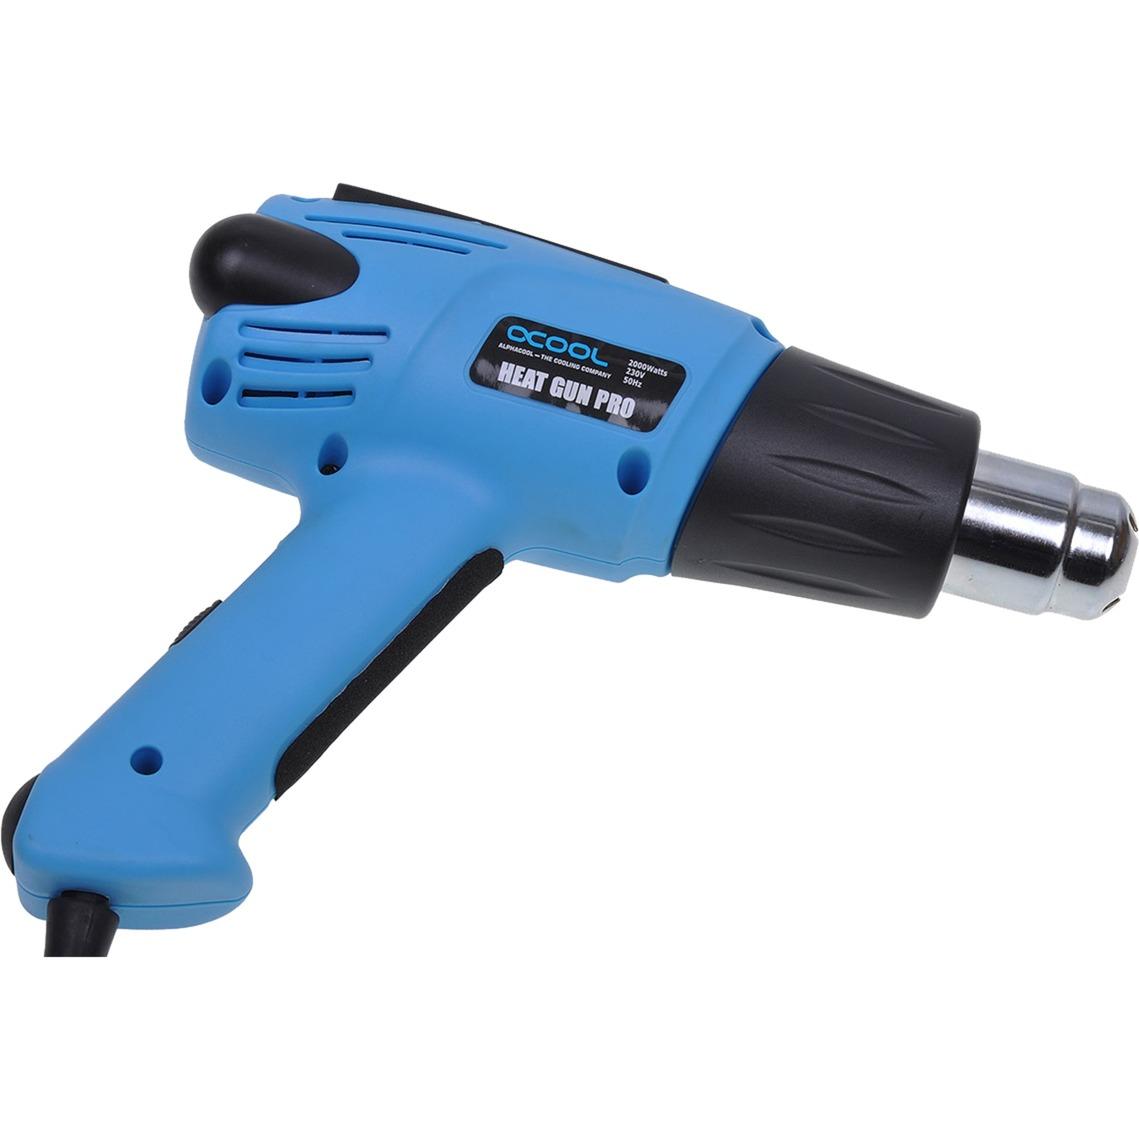 29111 pistola de calor eléctrica 600 l/min Negro, Azul 2000 W, Decapador por aire caliente